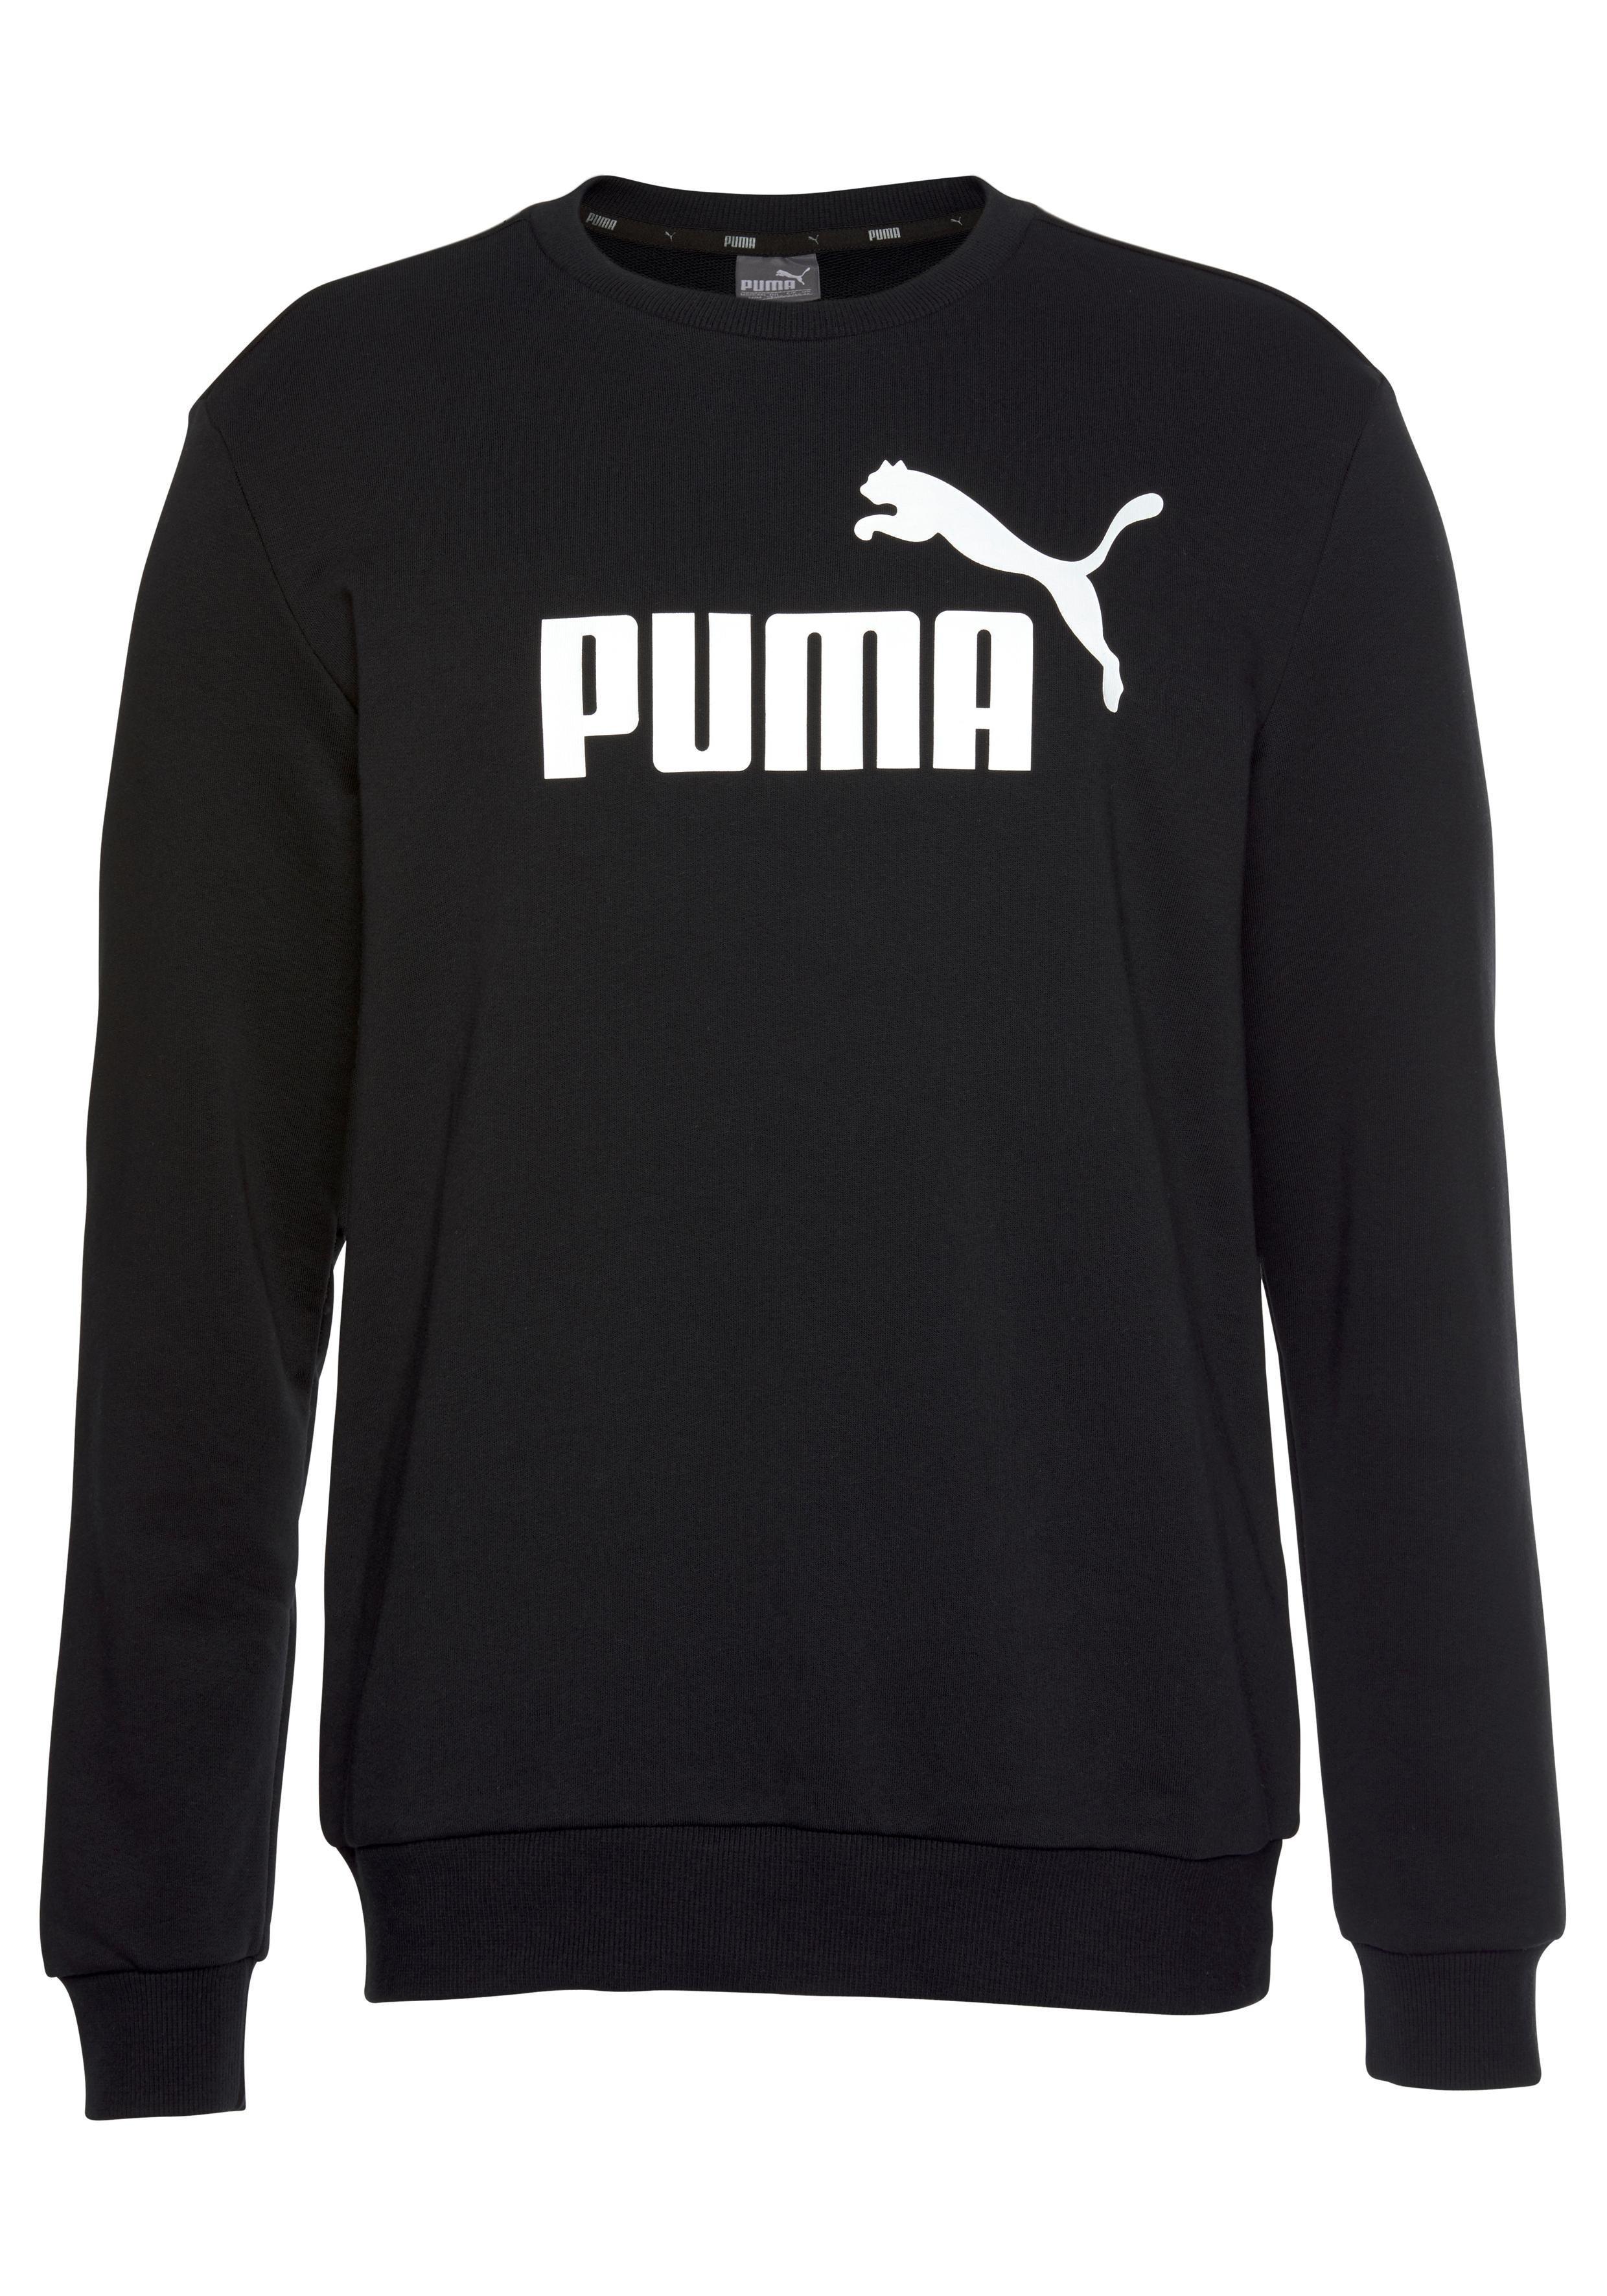 PUMA Sweatshirt »ESS LOGO CREW SWEAT TR BIG LOGO«   Bekleidung > Shirts > Sonstige Shirts   PUMA